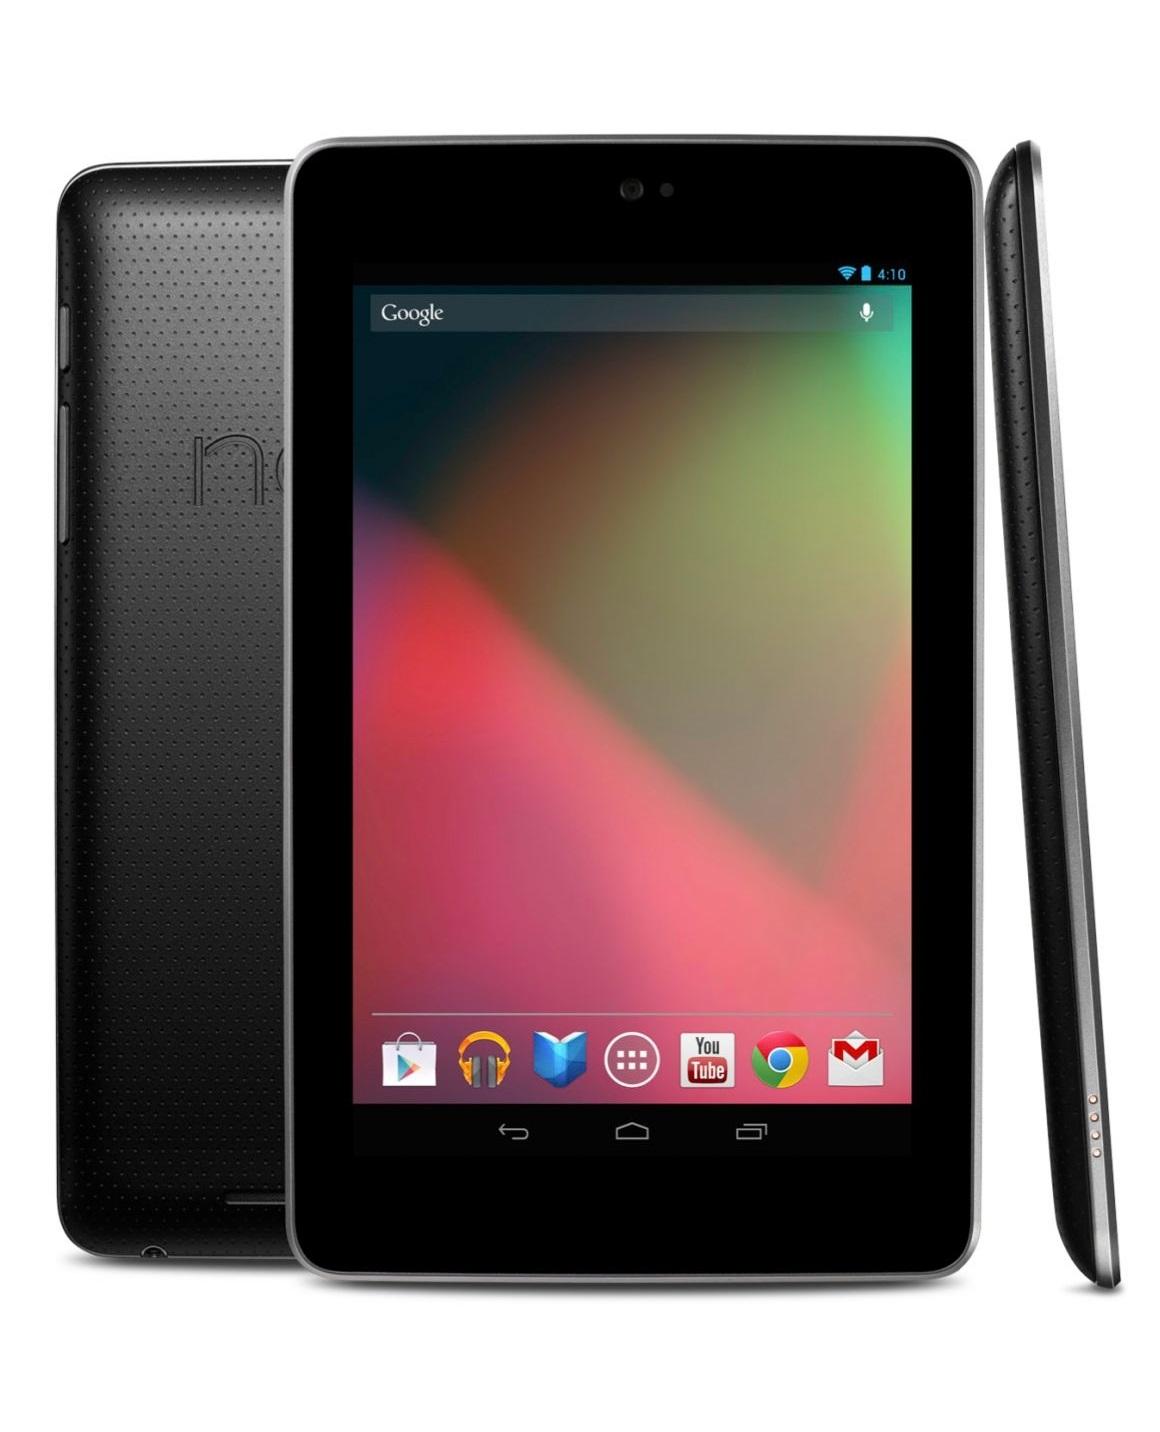 Google Nexus 7 2012